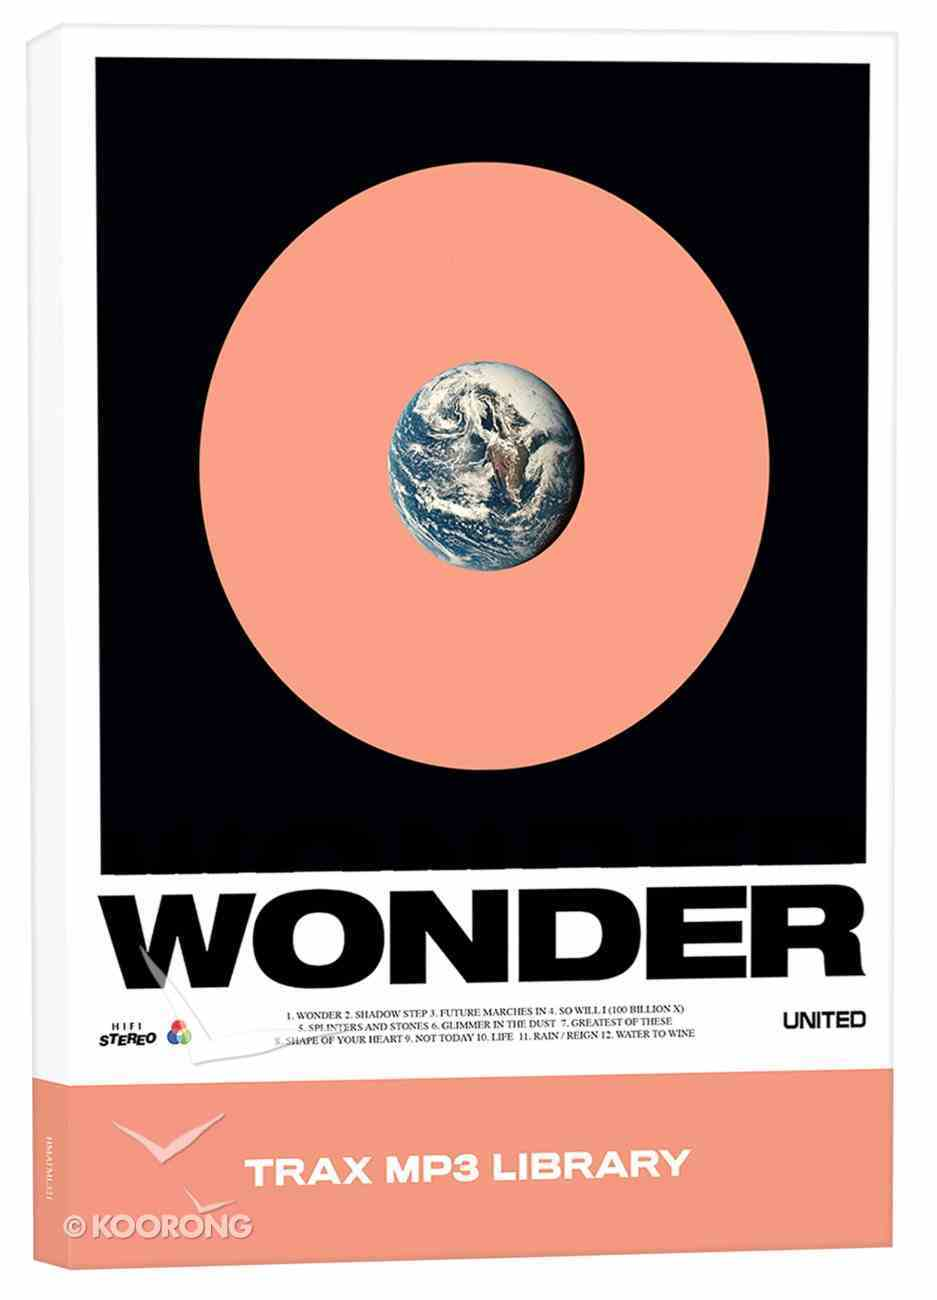 Hillsong United 2017: Wonder (Trax Mp3 Library) CD